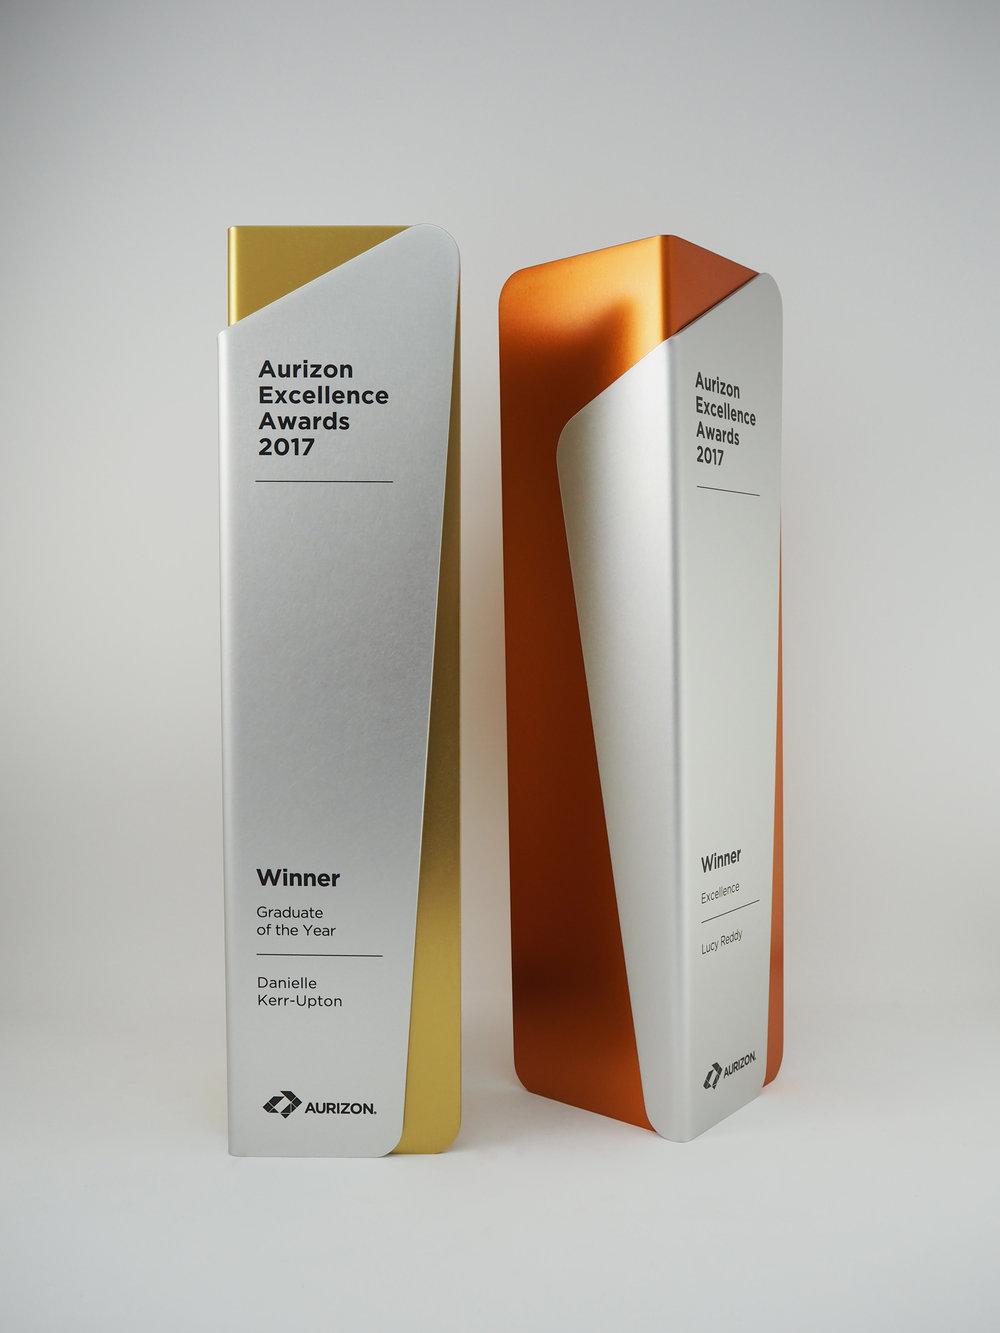 aurizon-excellence-awards-aluminium-corporate-trophy-01.jpg